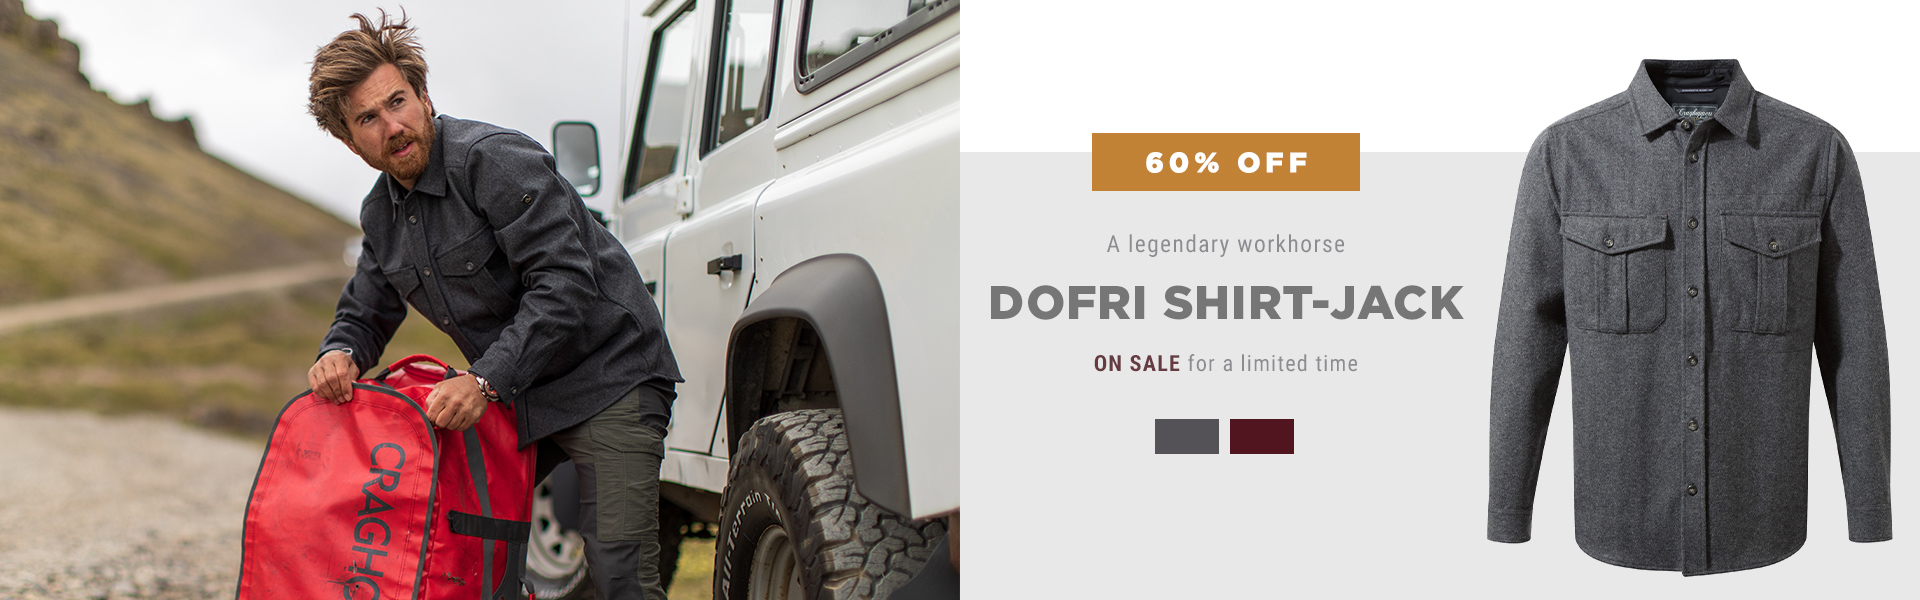 Dofri Shirt-Jack On Sale For a Limited Time